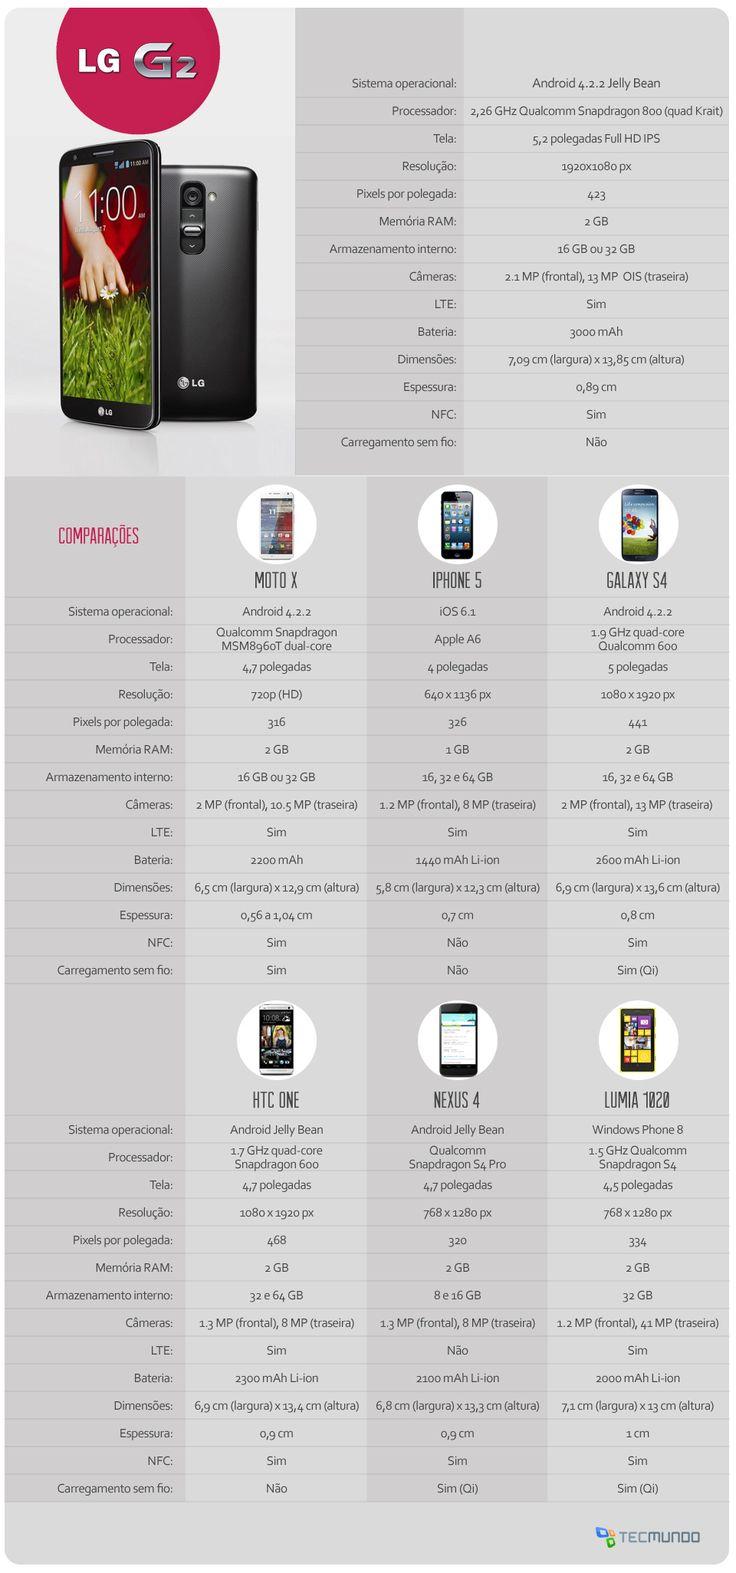 Infográfico - Comparativo: LG G2 x HTC One x Galaxy S4 x iPhone 5 x Moto X x Lumia 1020